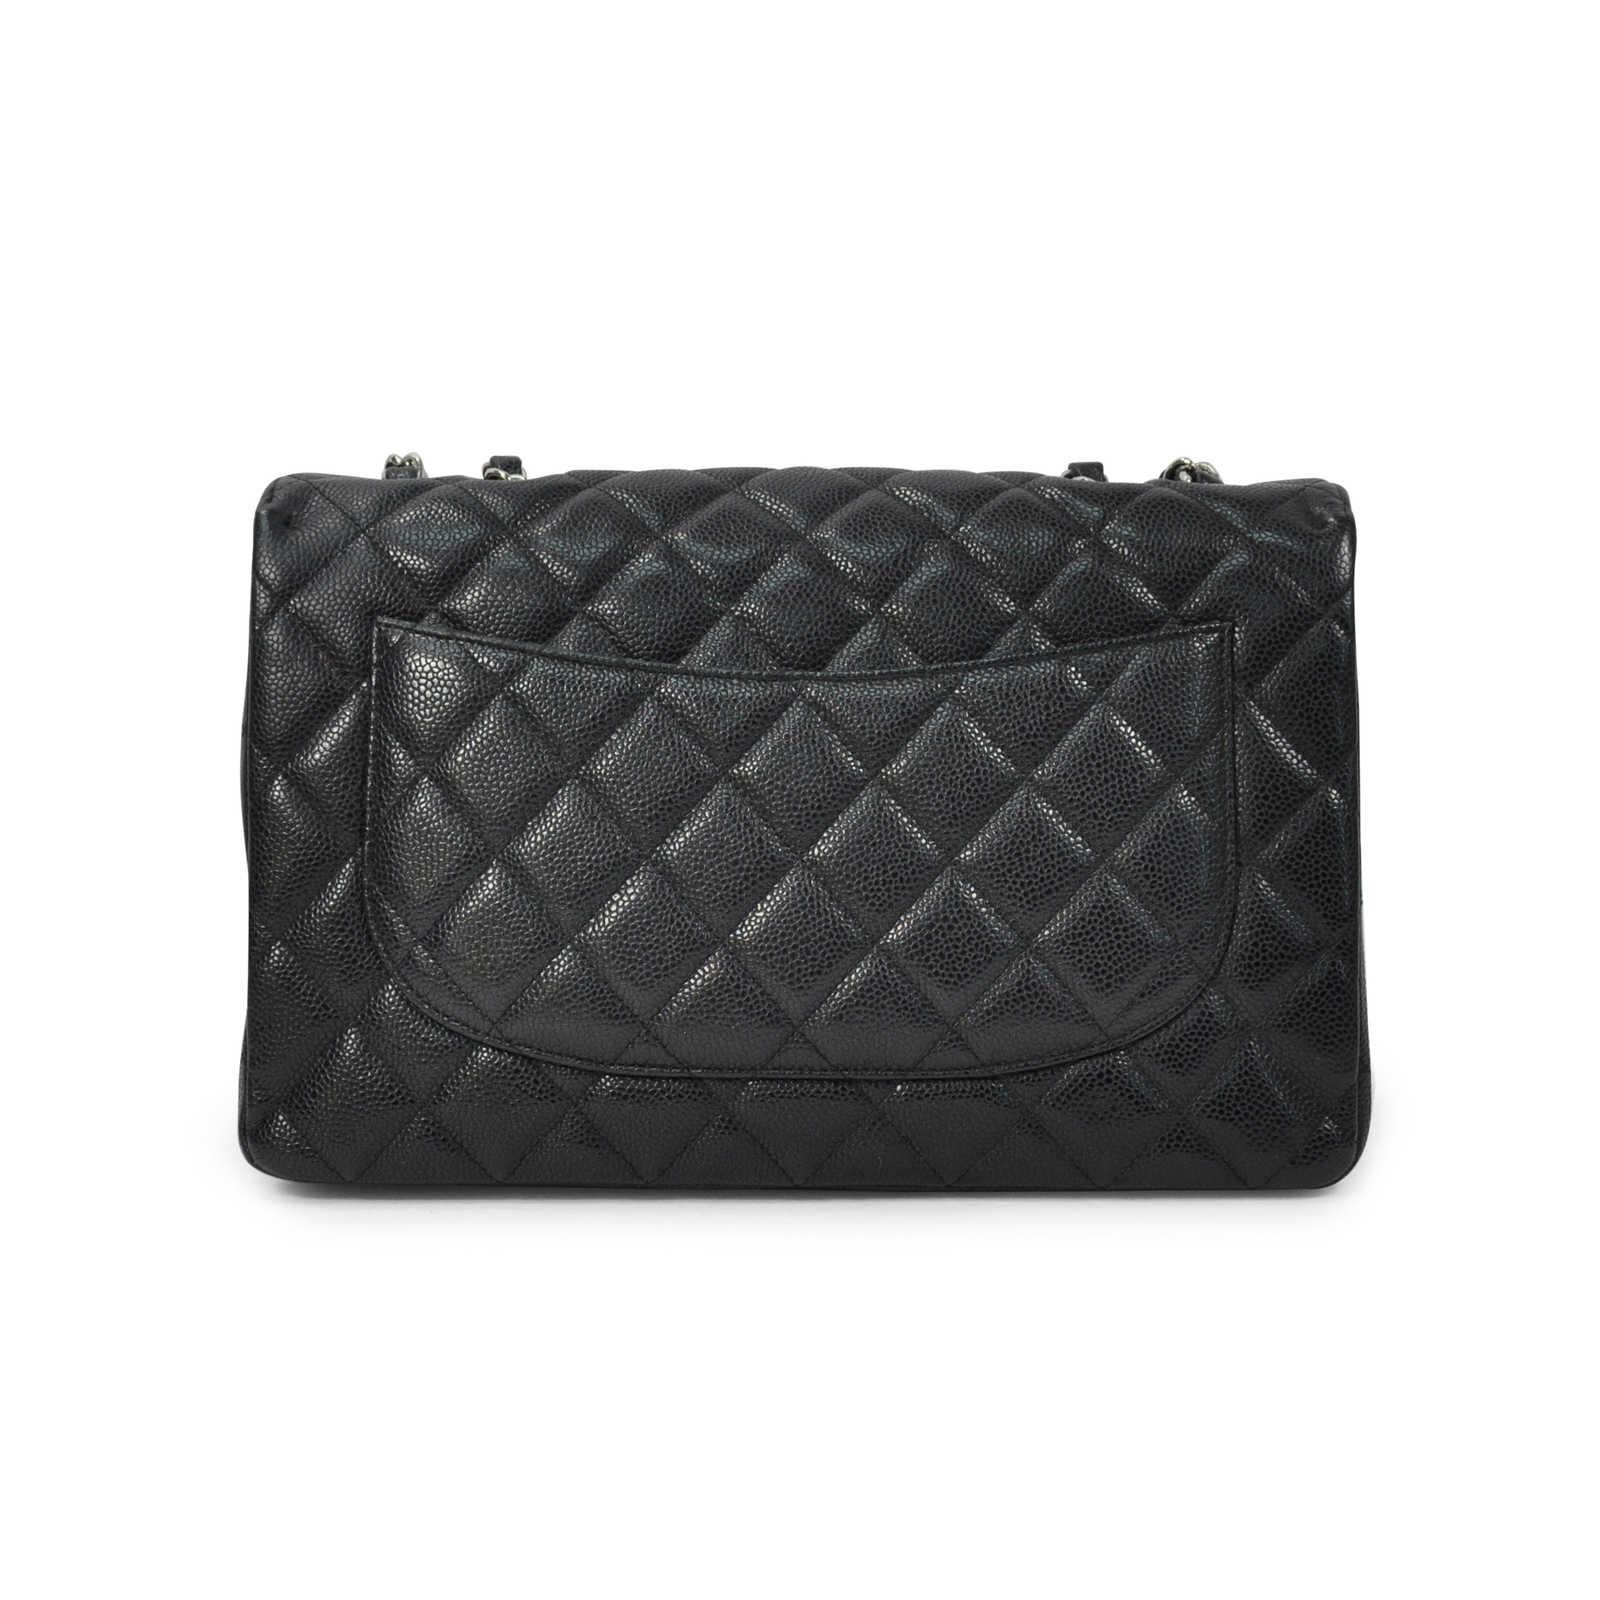 ee0c3906e53f ... Authentic Second Hand Chanel Caviar Jumbo Single Flap (PSS-311-00014)  ...